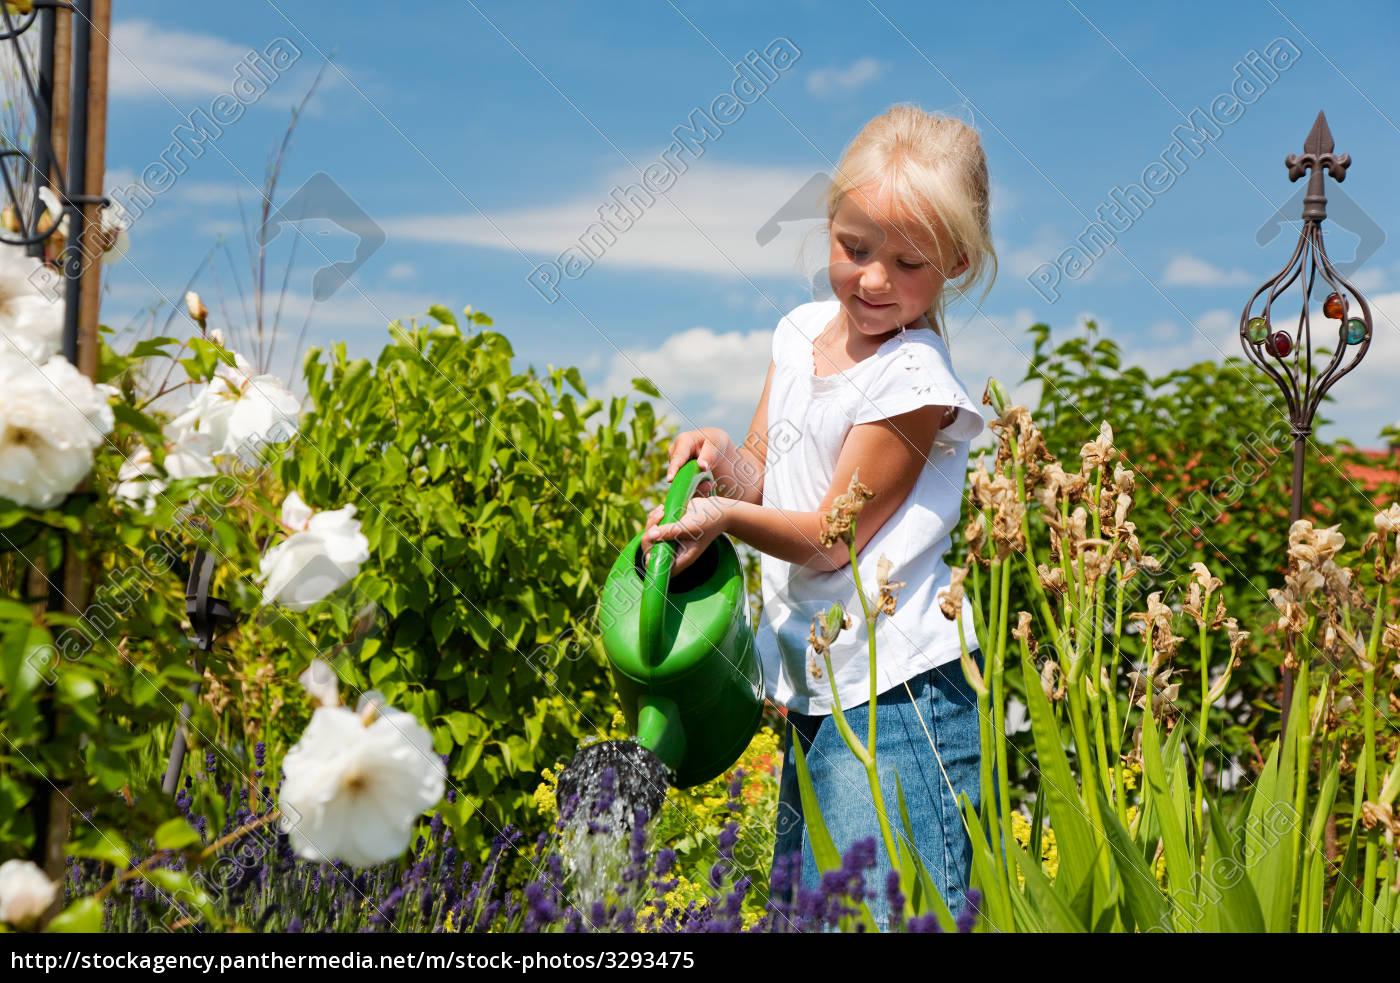 little, girl, pours, flowers - 3293475